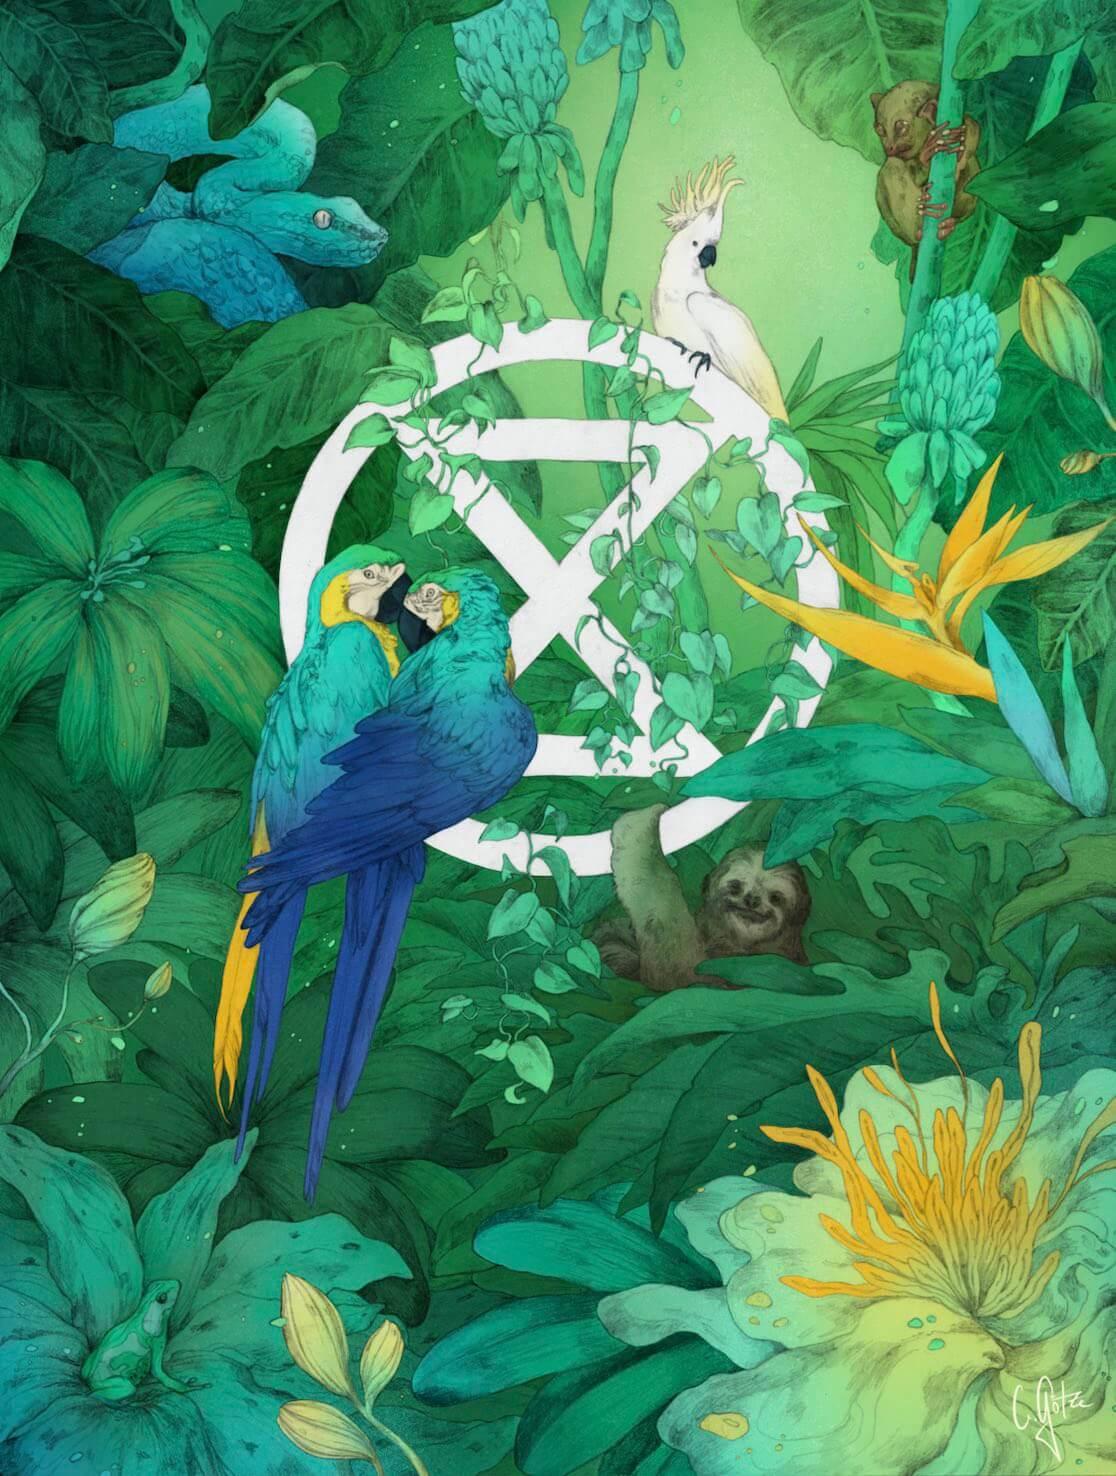 Extinction symbol with birds